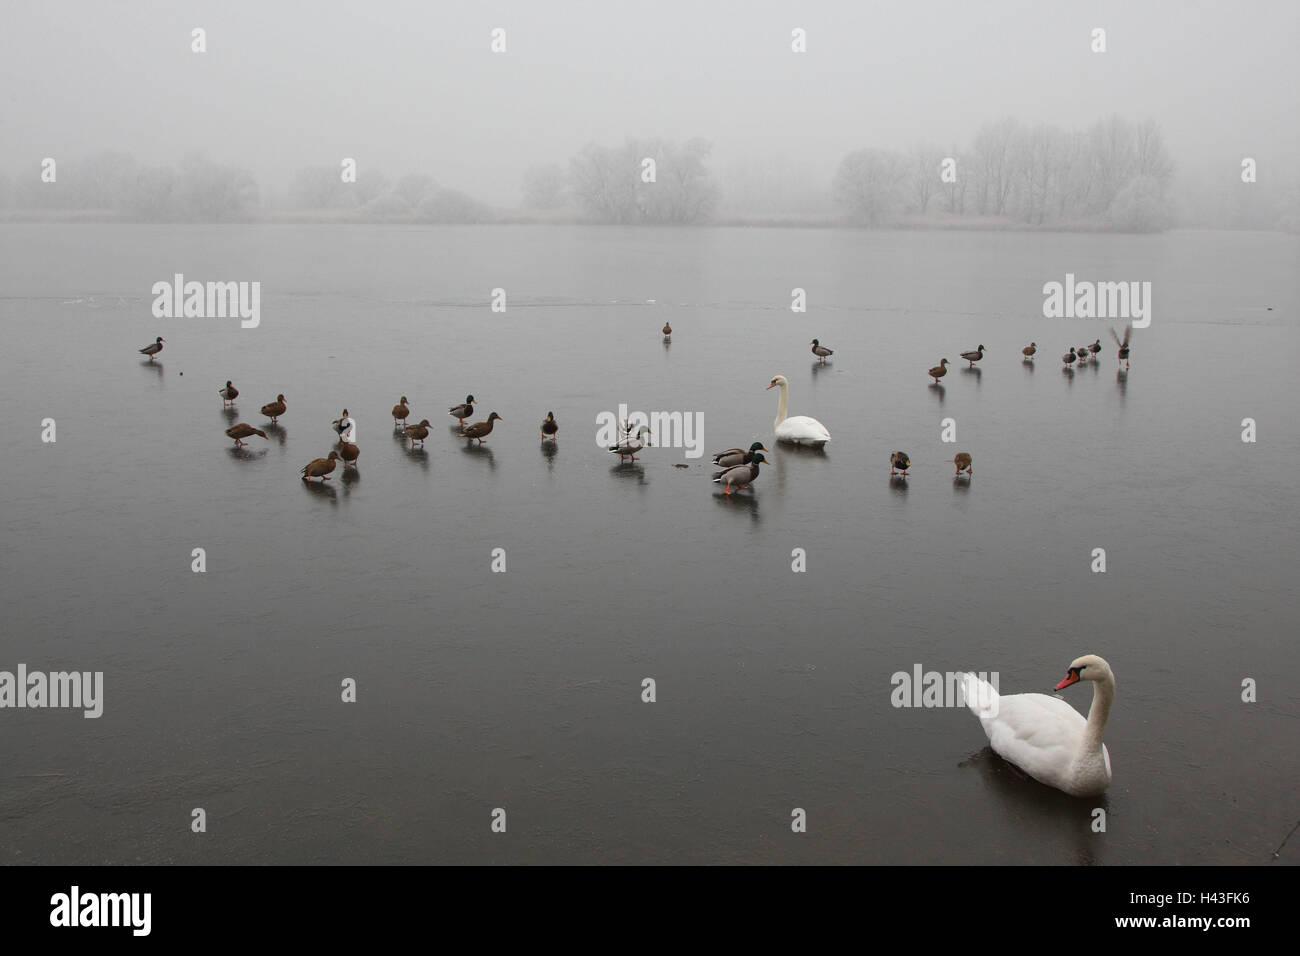 Hump swans, mallards, sheet ice, Europe, birds, swans, ducks, froze, Germany, wild animals, animals, river, water, - Stock Image